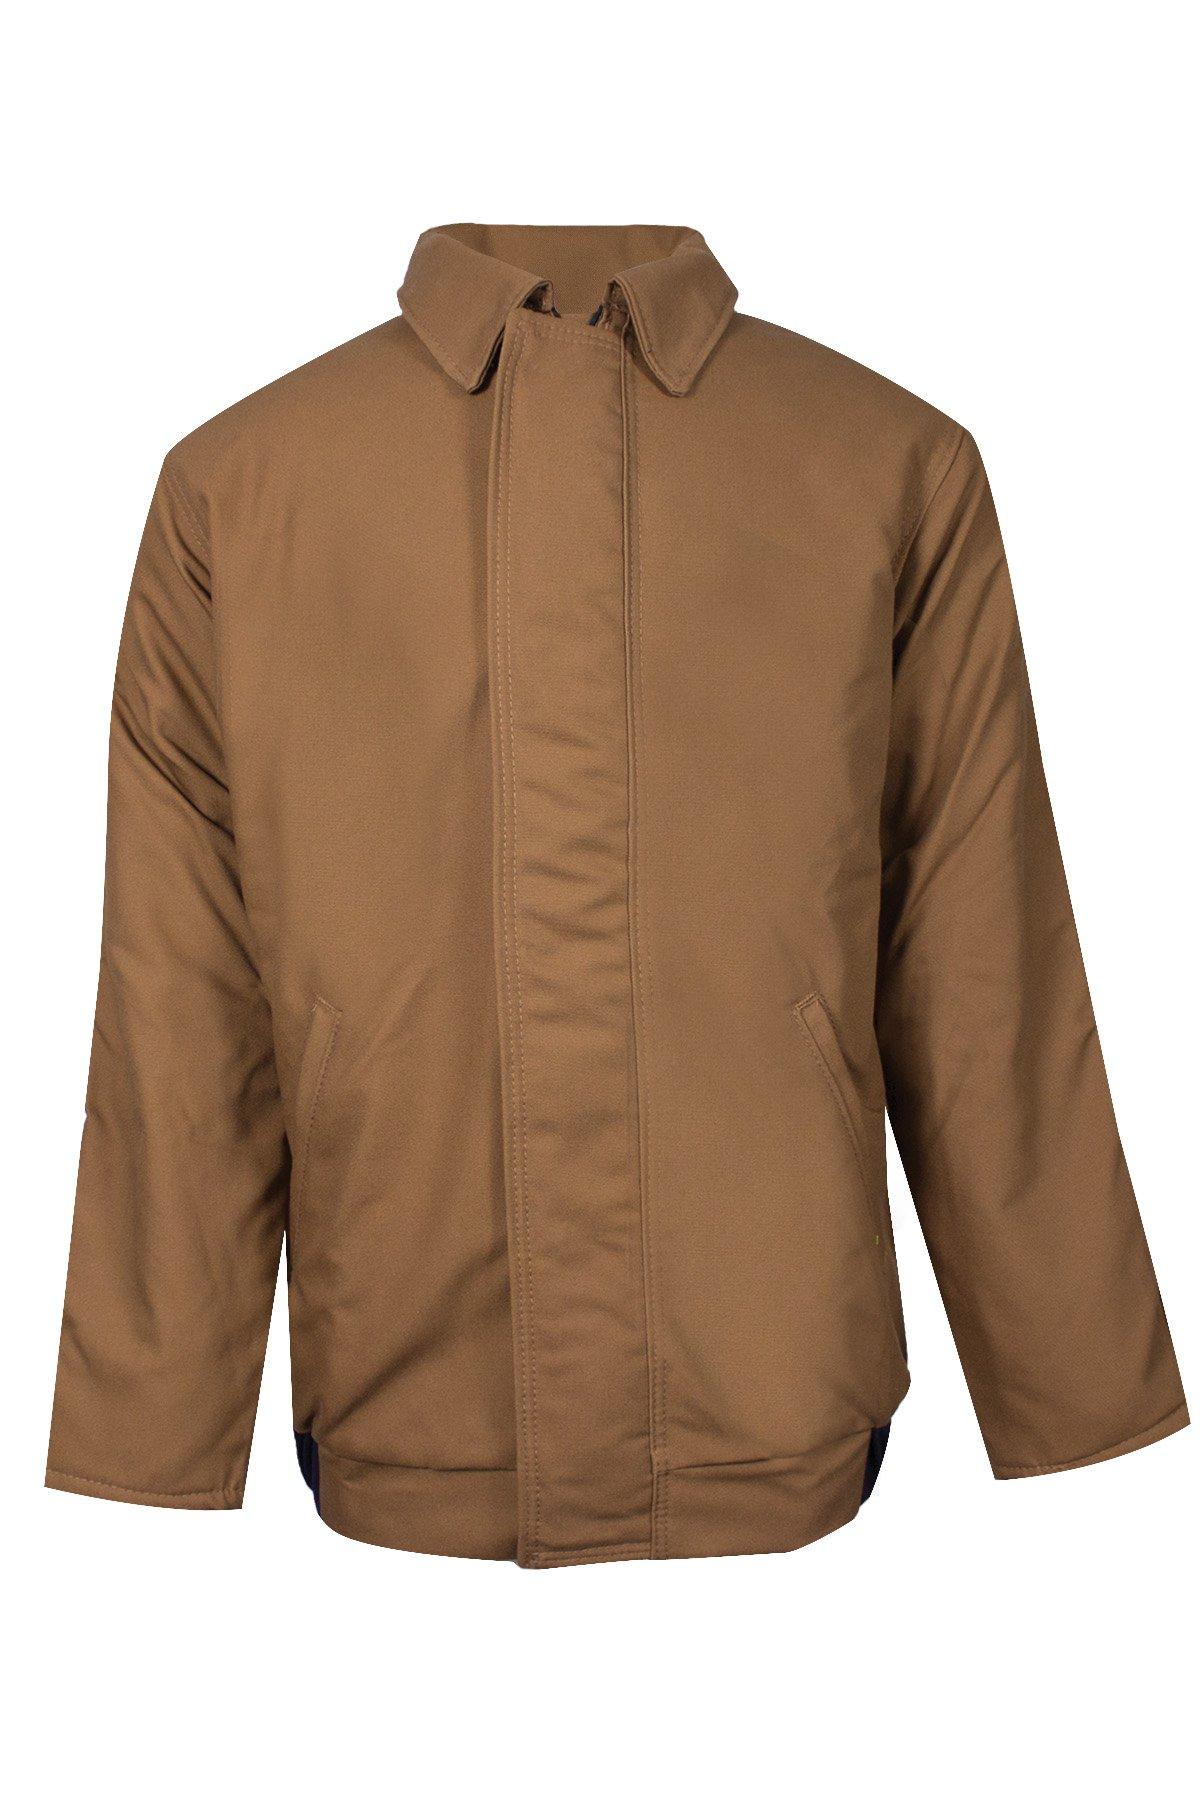 National Safety Apparel C34UMMQ3XRG Explorer Series Bomber Jacket, Modaquilt Lined 88% Cotton/12% Nylon Duck FR, 3X-Large, Brown